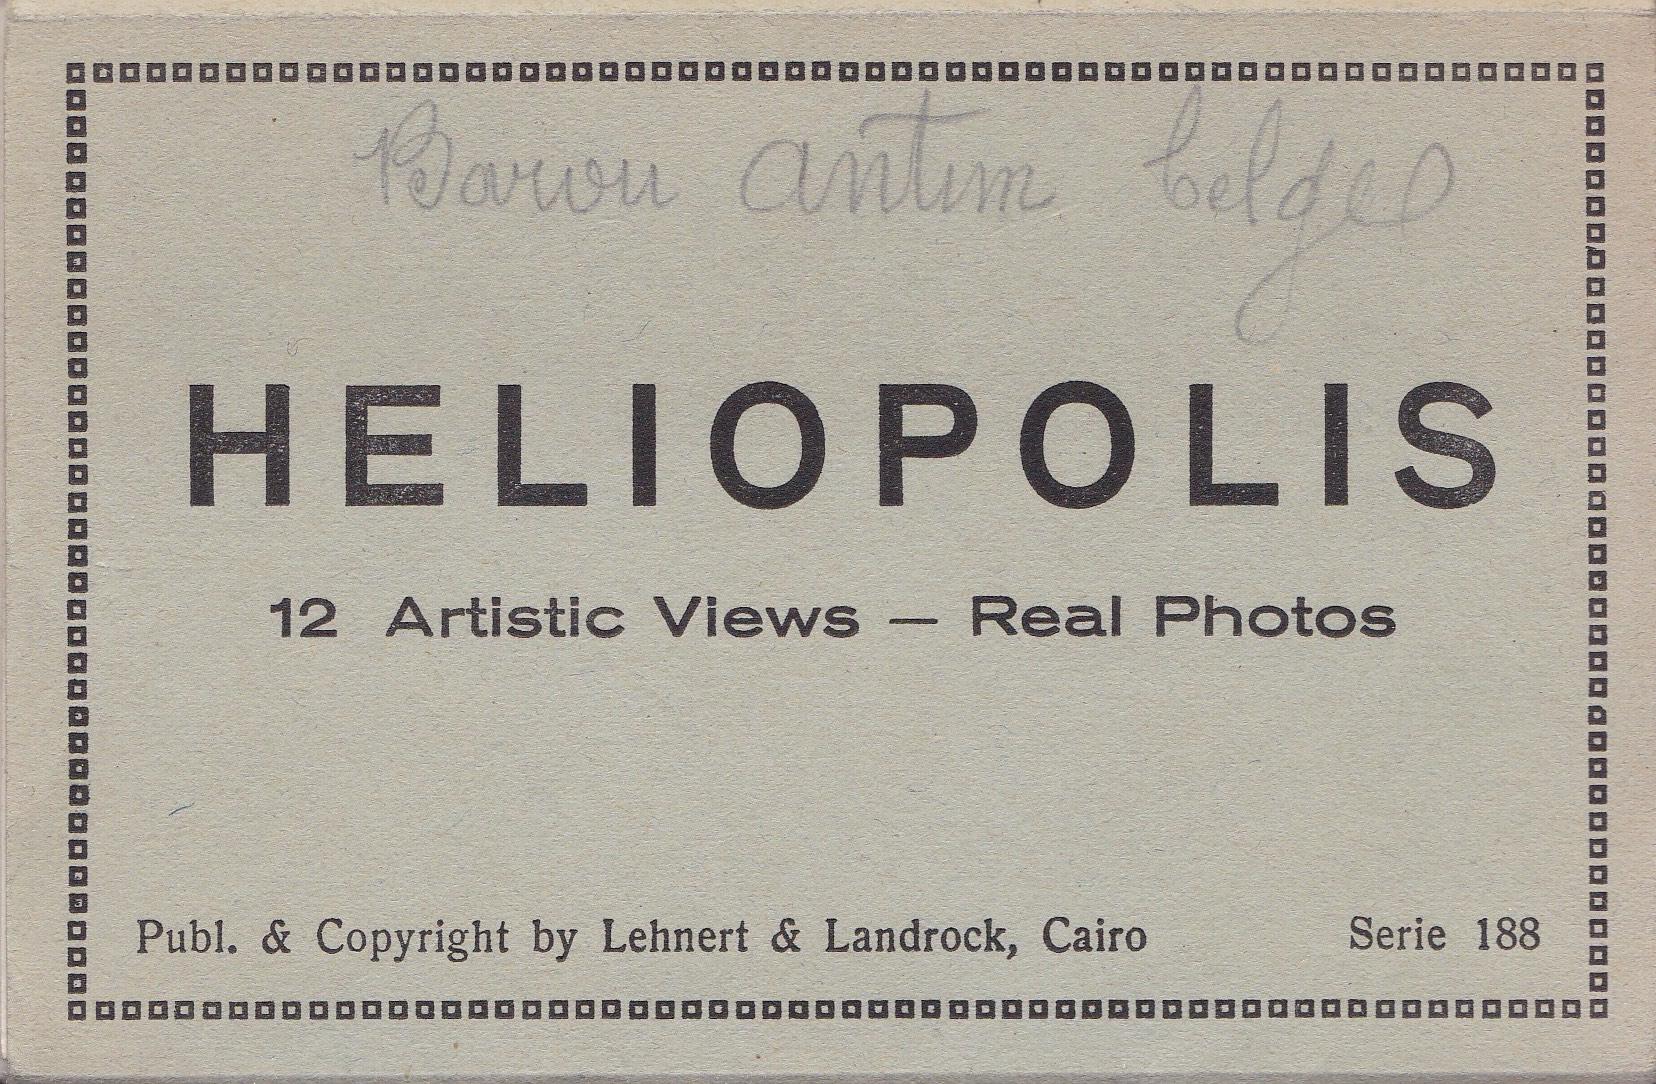 Postcards Heliopolis – 12 Artistic Views – Lehnert & Landrock – serie 188 – ca 1925